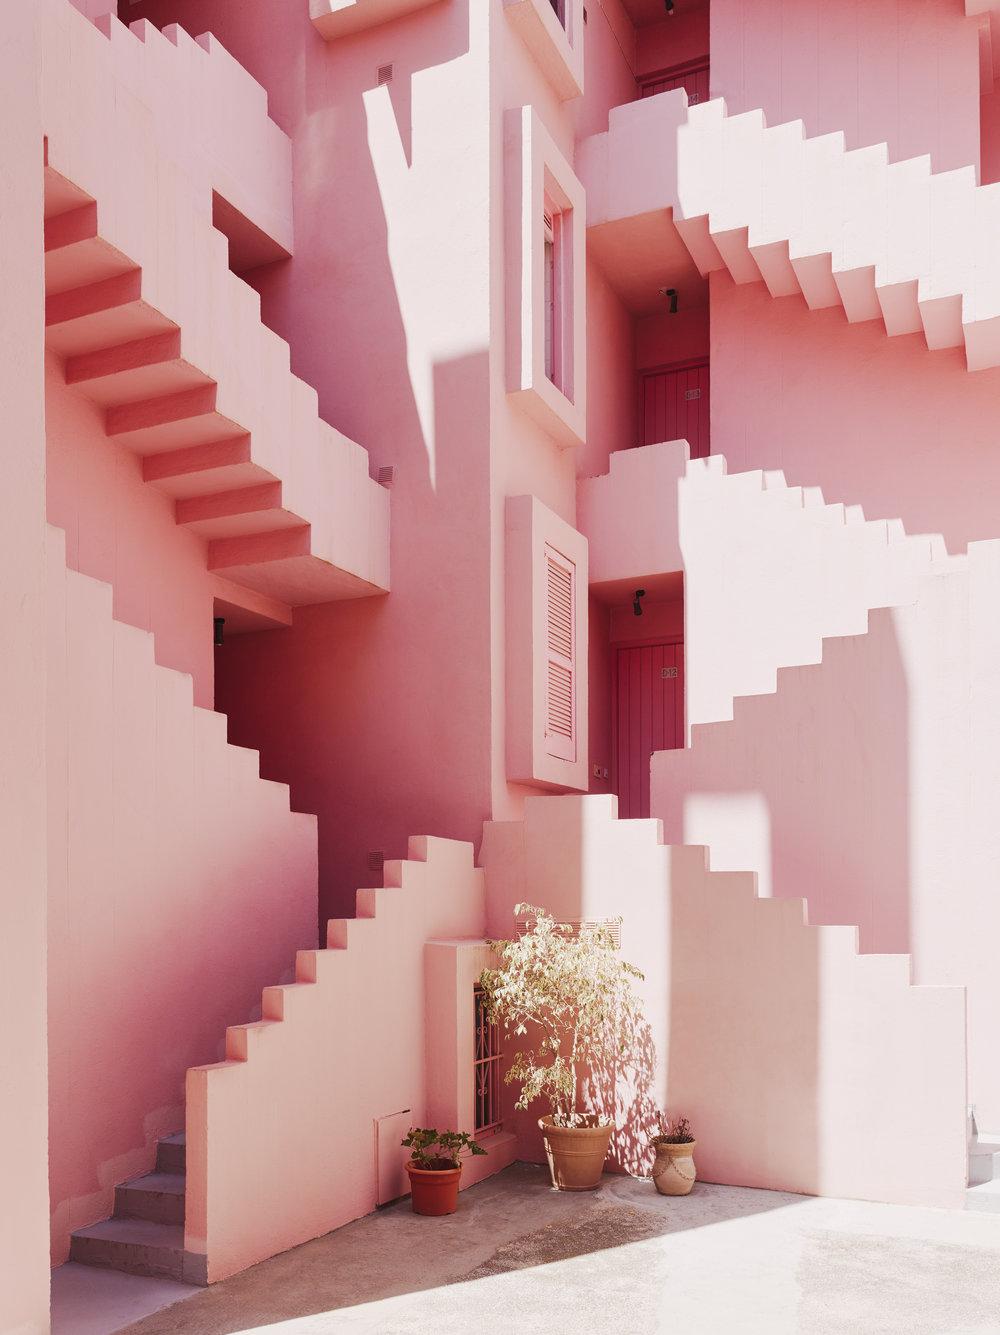 Muralla_Roja_Calpe_Spain_Ricardo_Bofill_Taller_Arquitectura_008.jpg